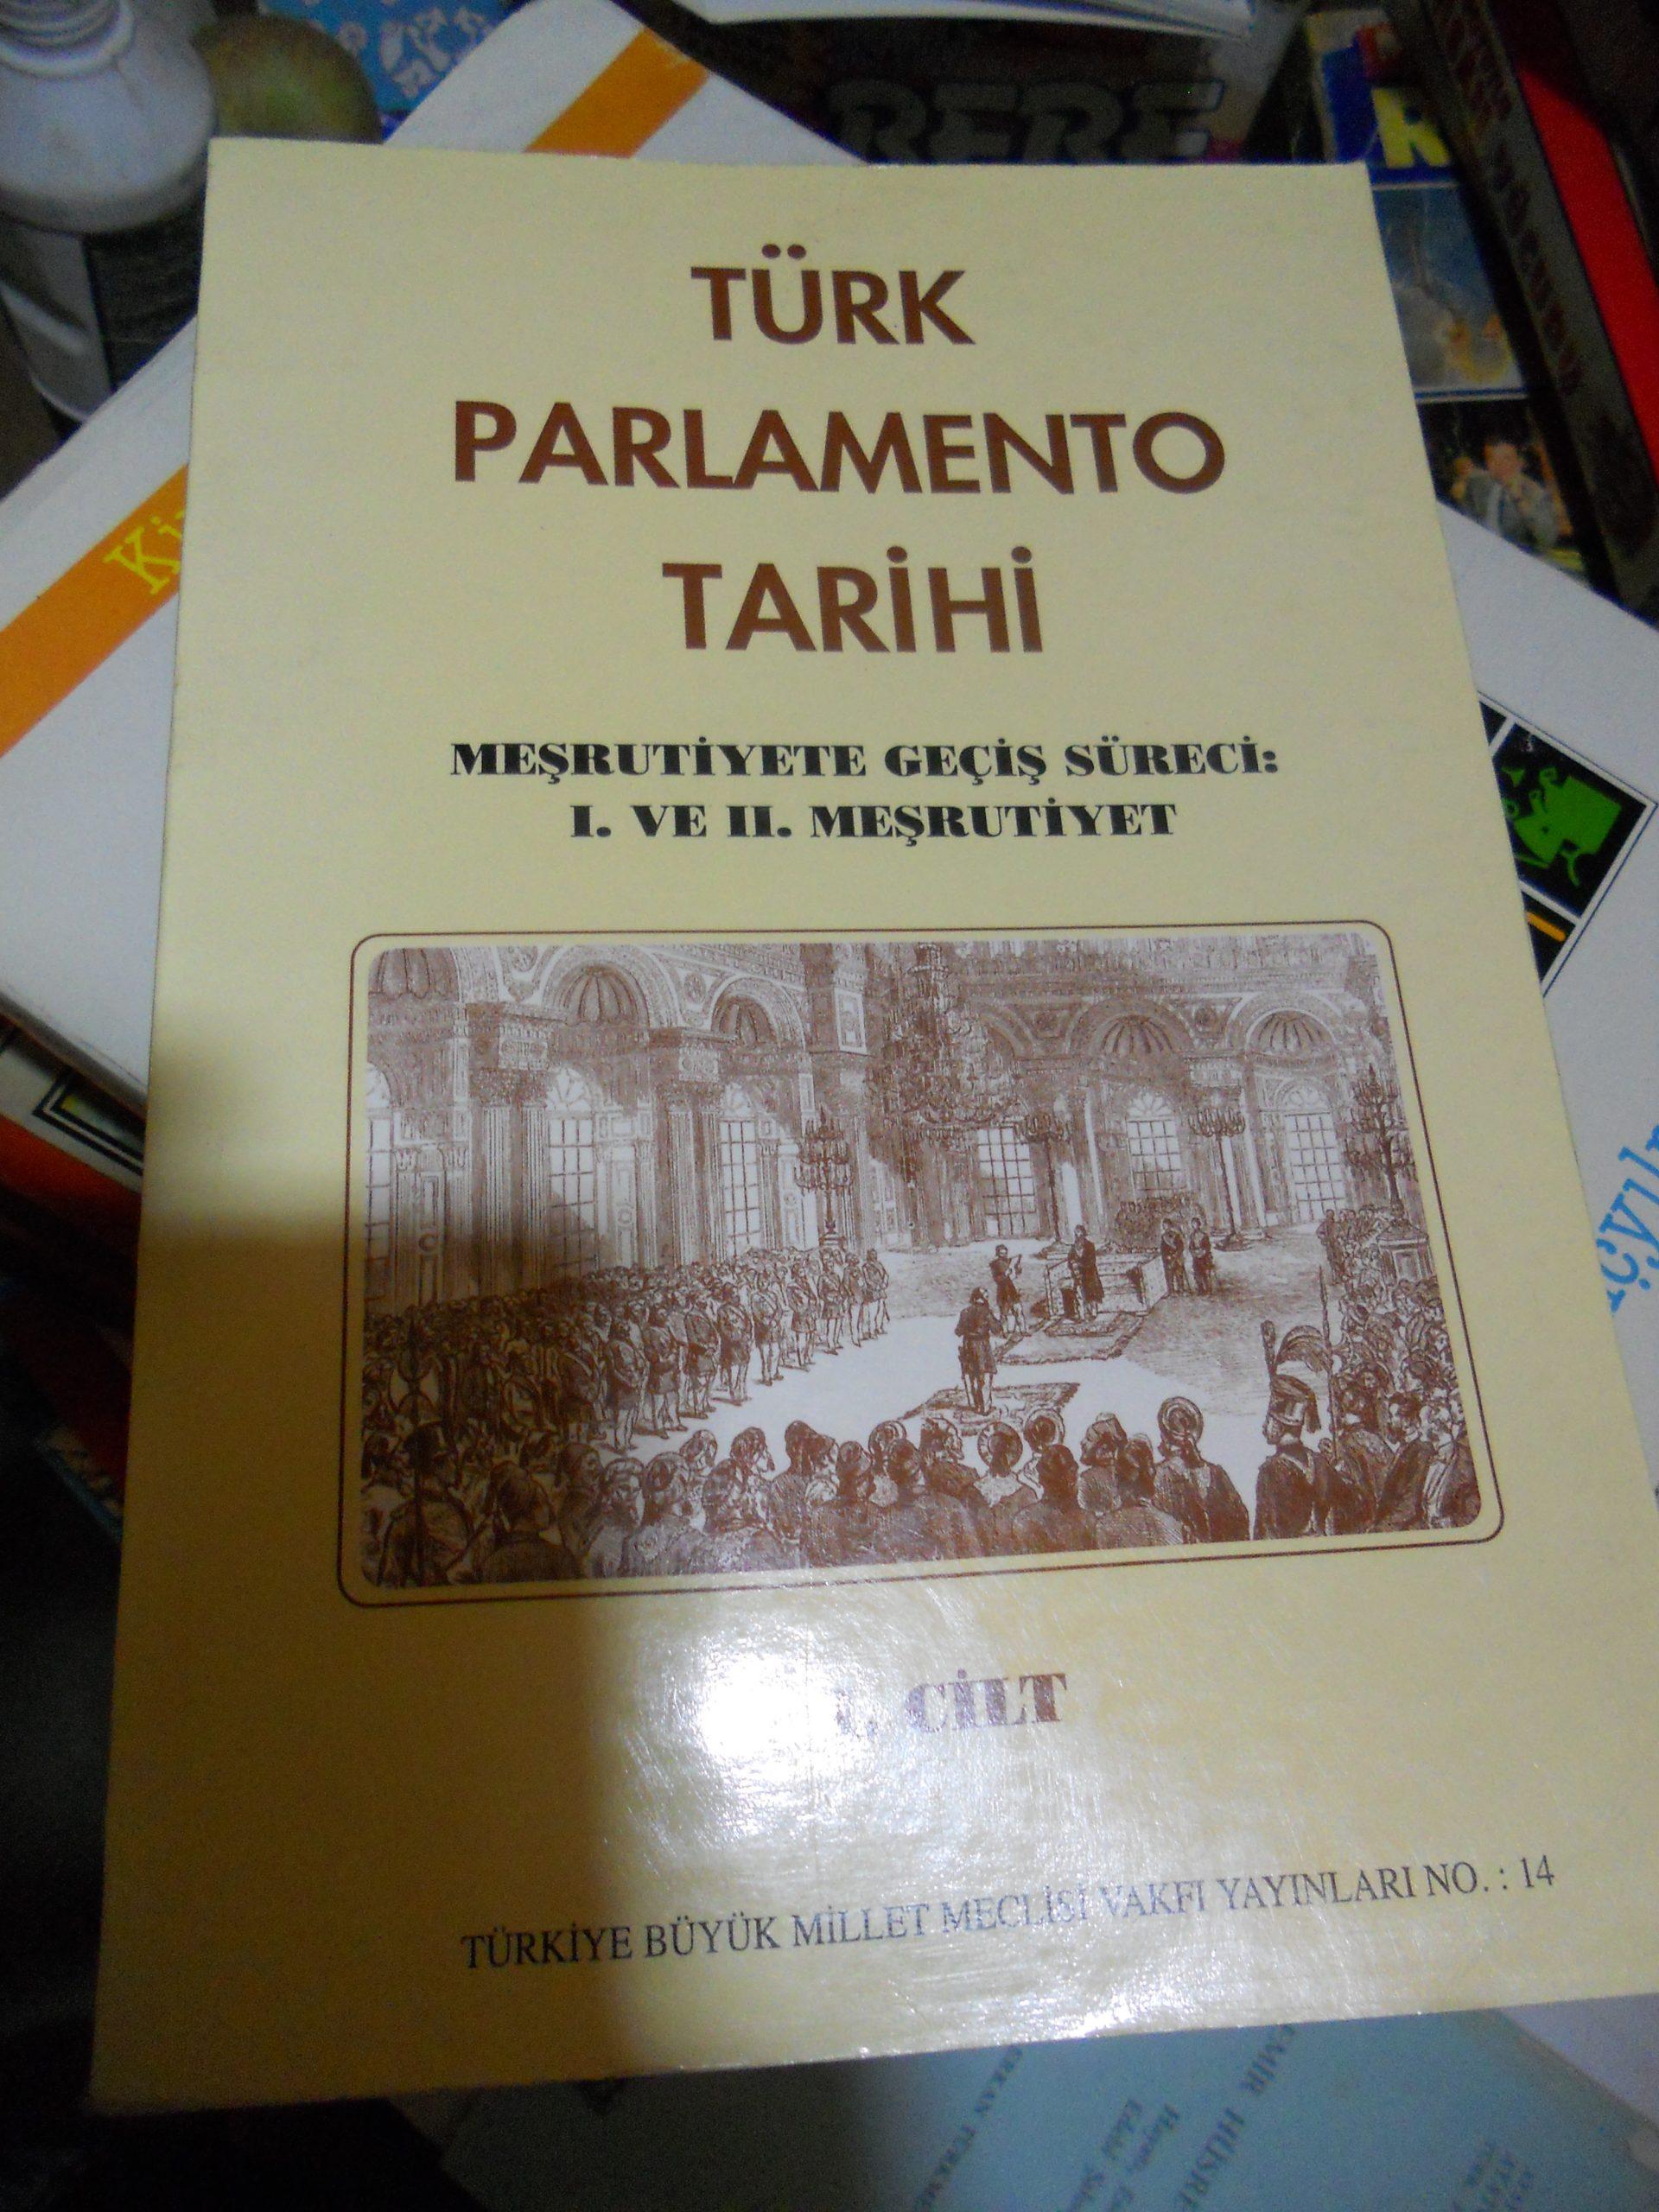 TÜRK PARLAMENTO TARİHİ/I-II MEŞRUTİYET-MİLLİ MÜCADELE /TOPLAM 5 CİLT/ 300 TL